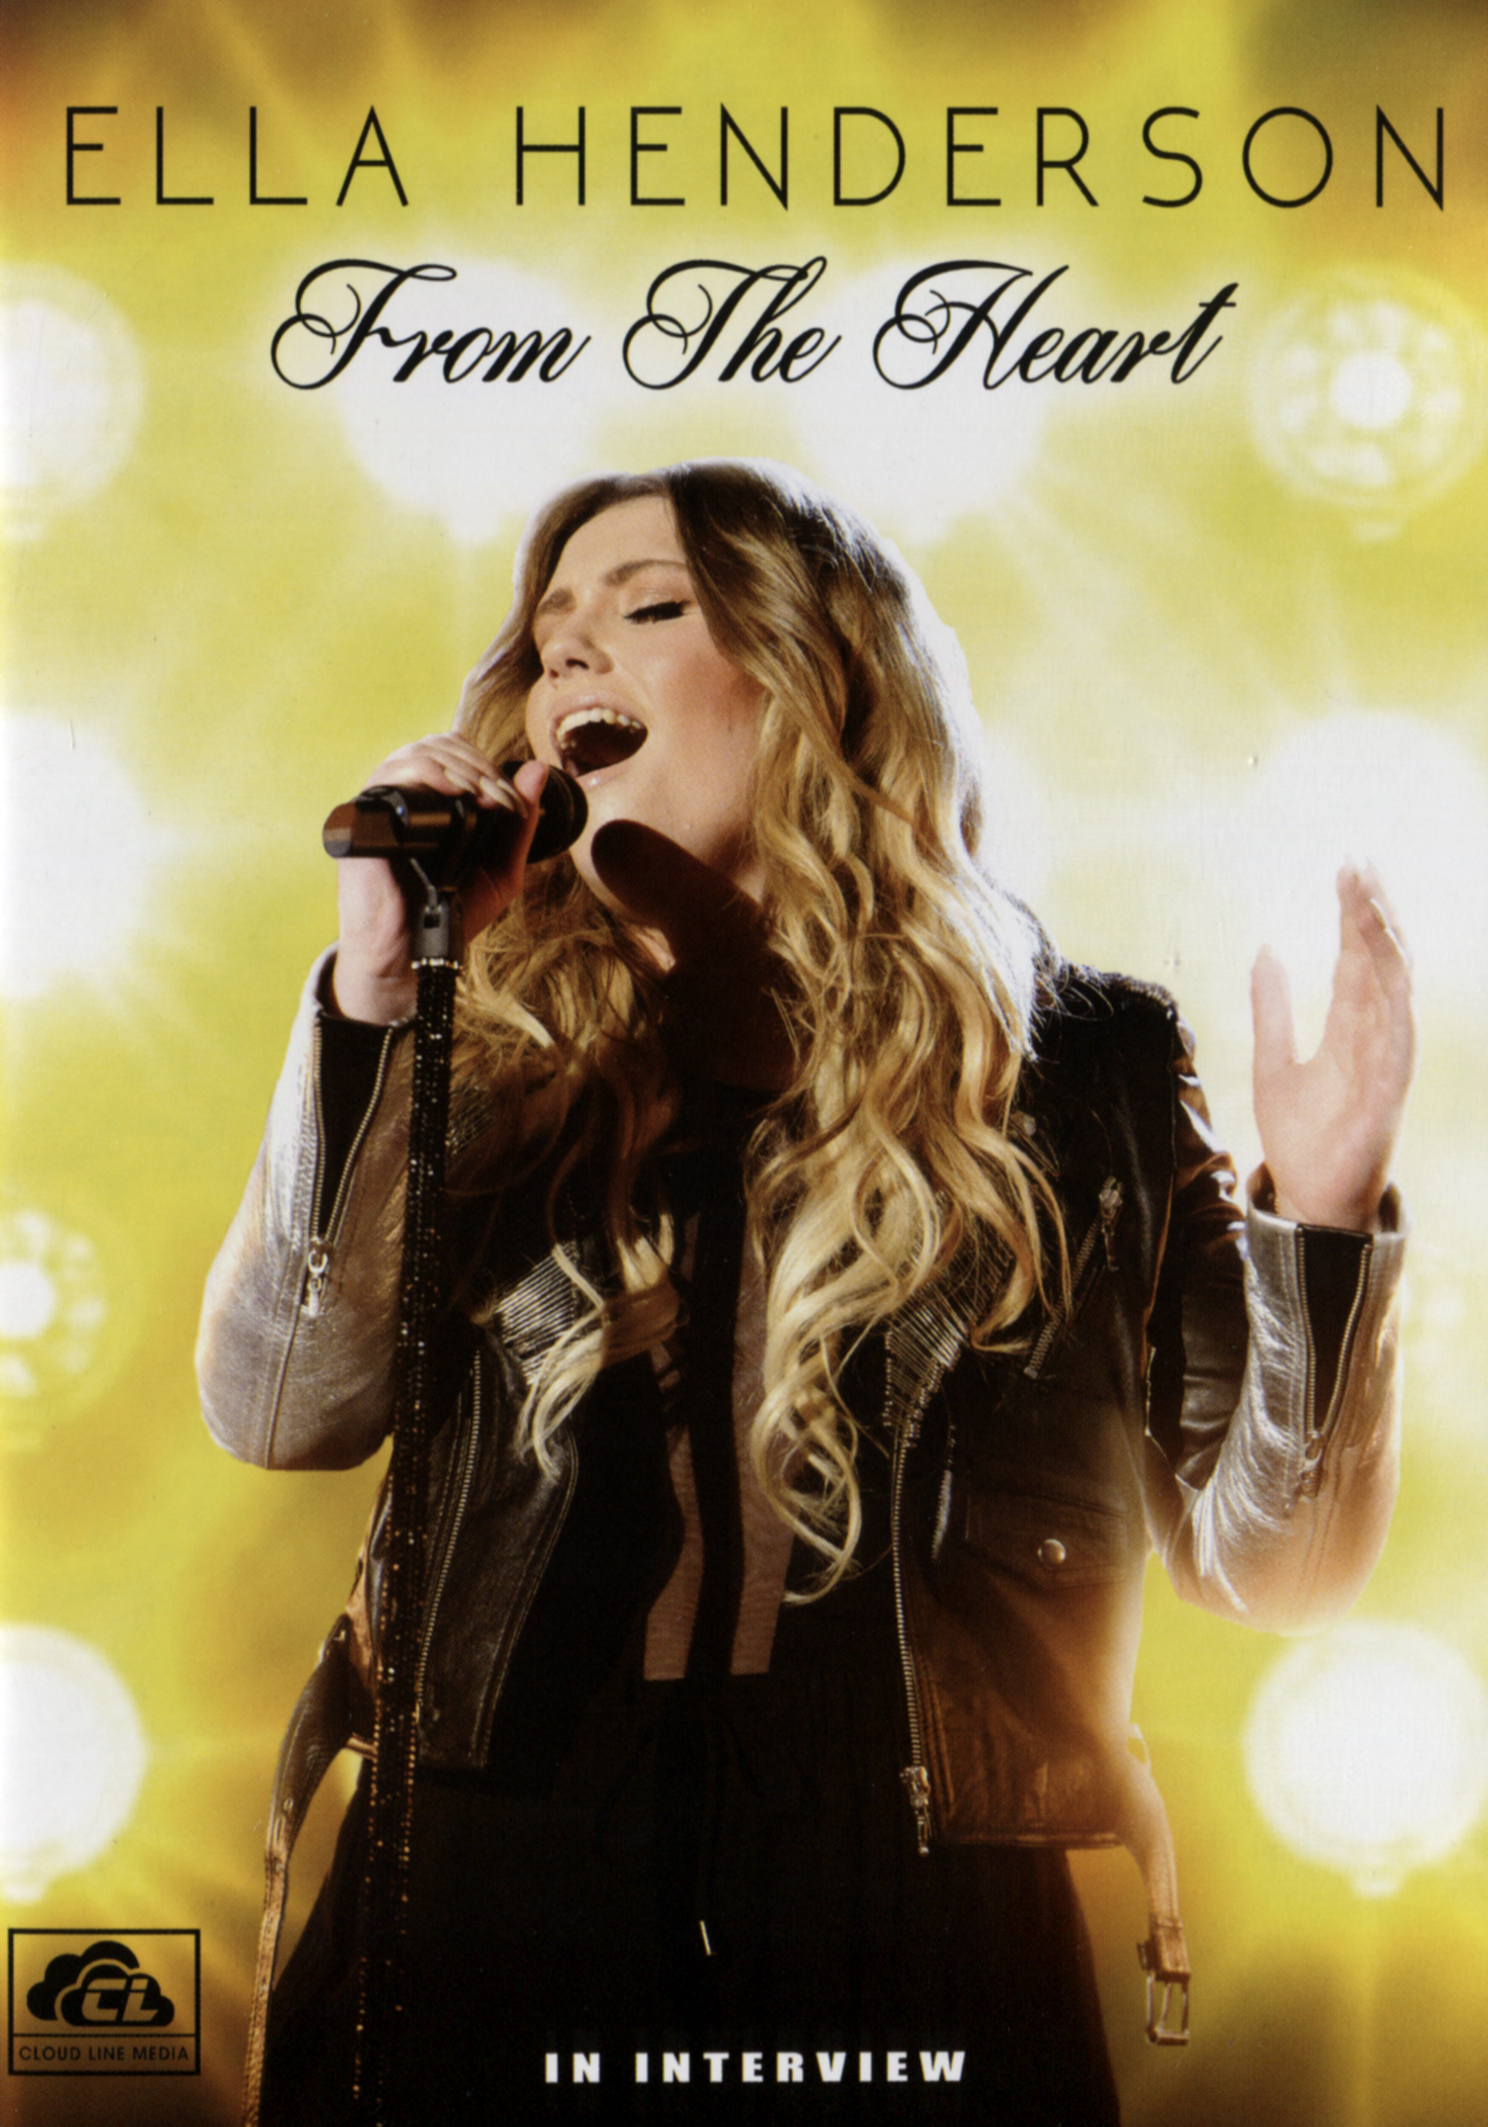 Ella Henderson: From the Heart